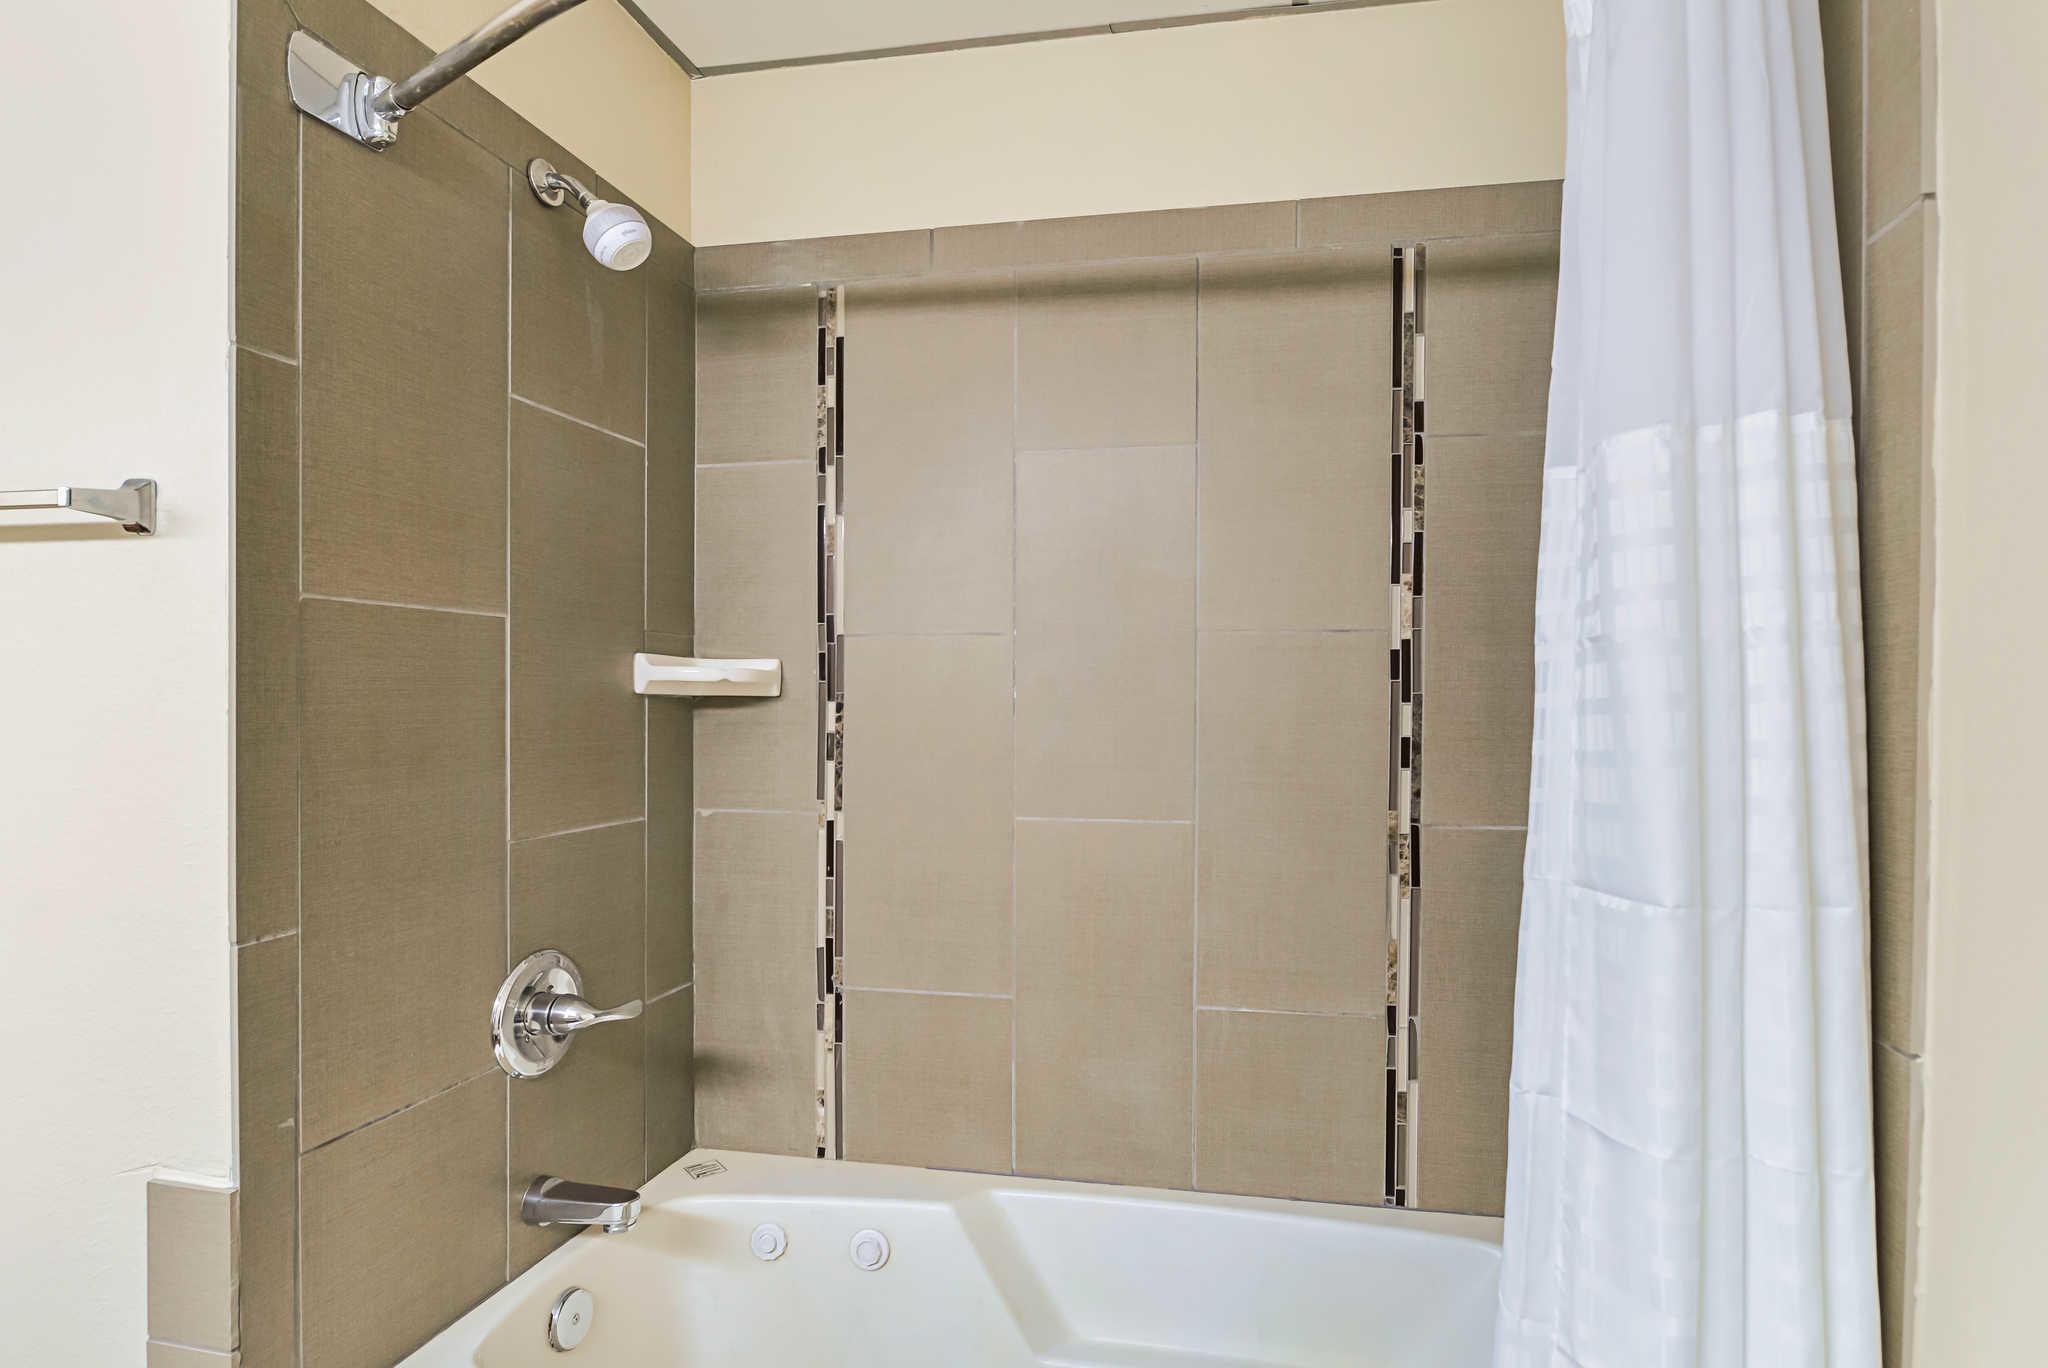 Comfort Suites image 40